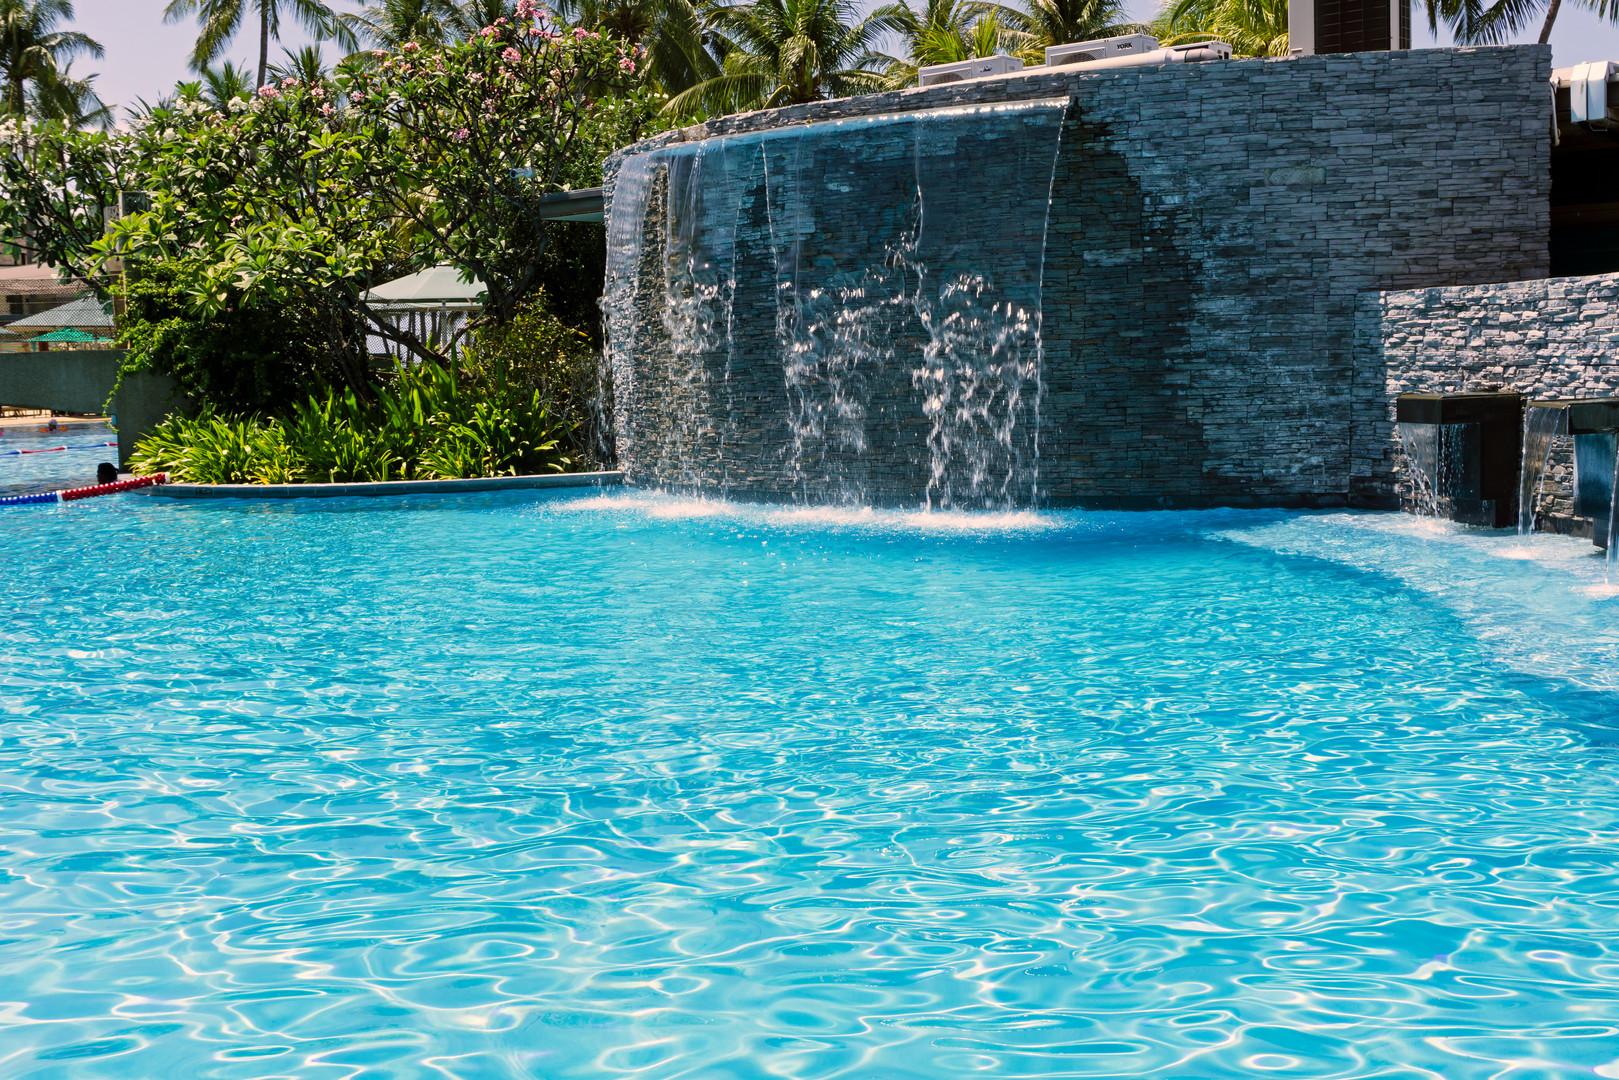 Man made waterfall at the swimming pool,